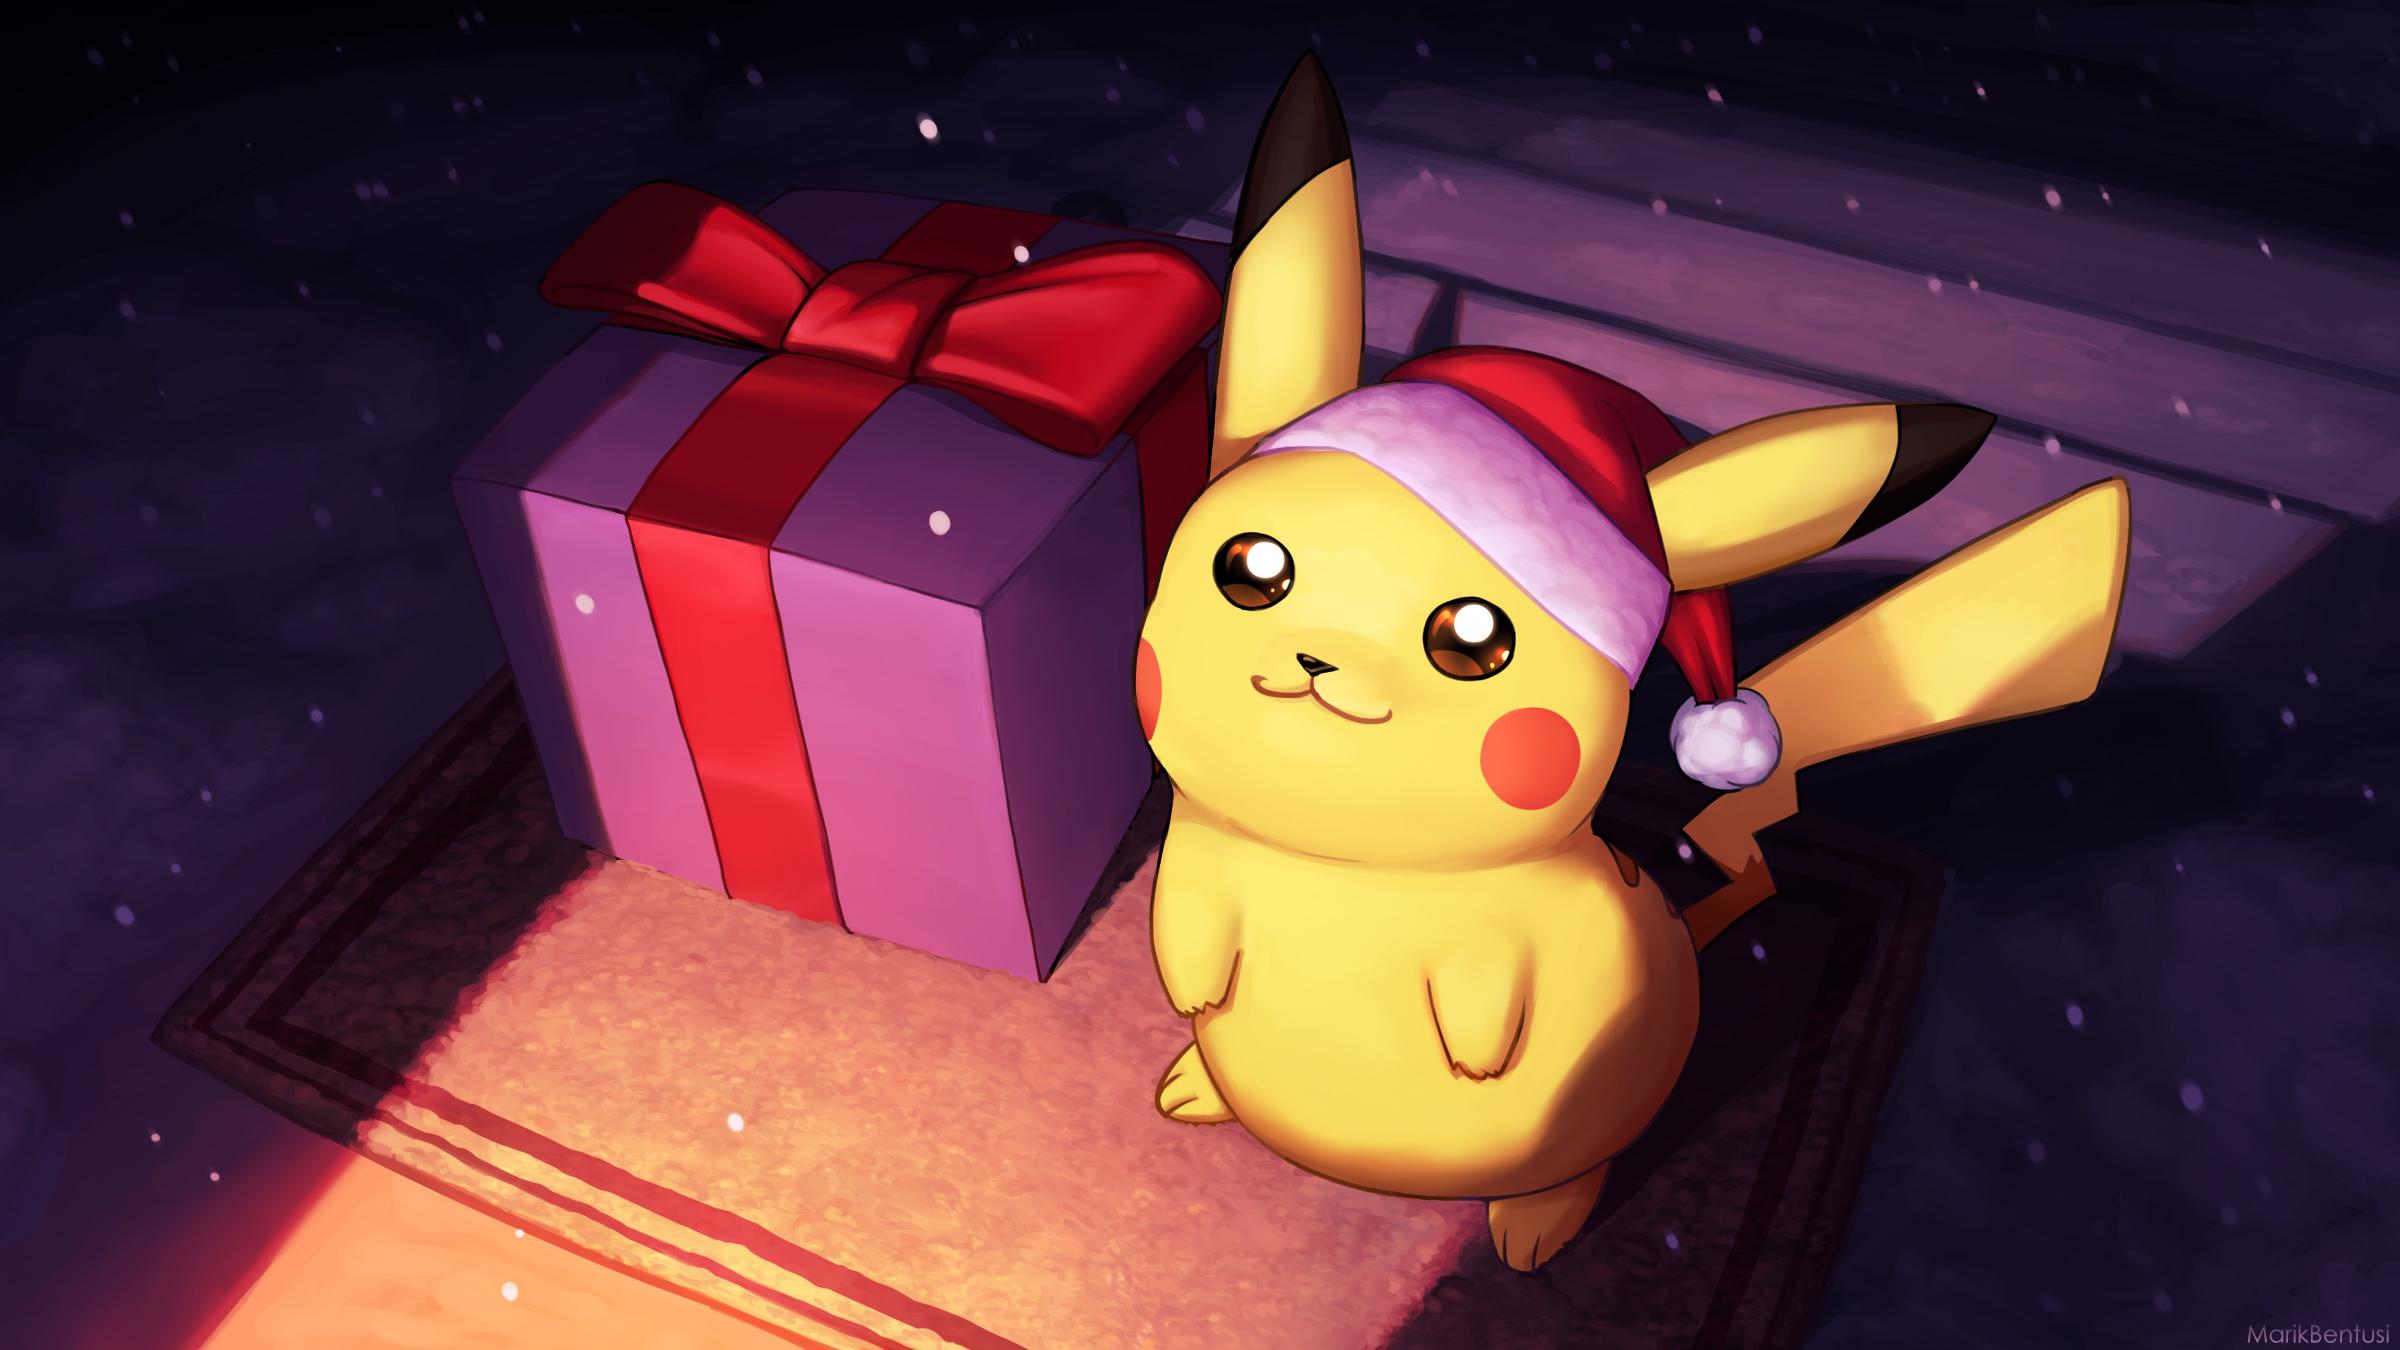 Christmas Pikachu.Christmas Pikachu Jpg Myconfinedspace